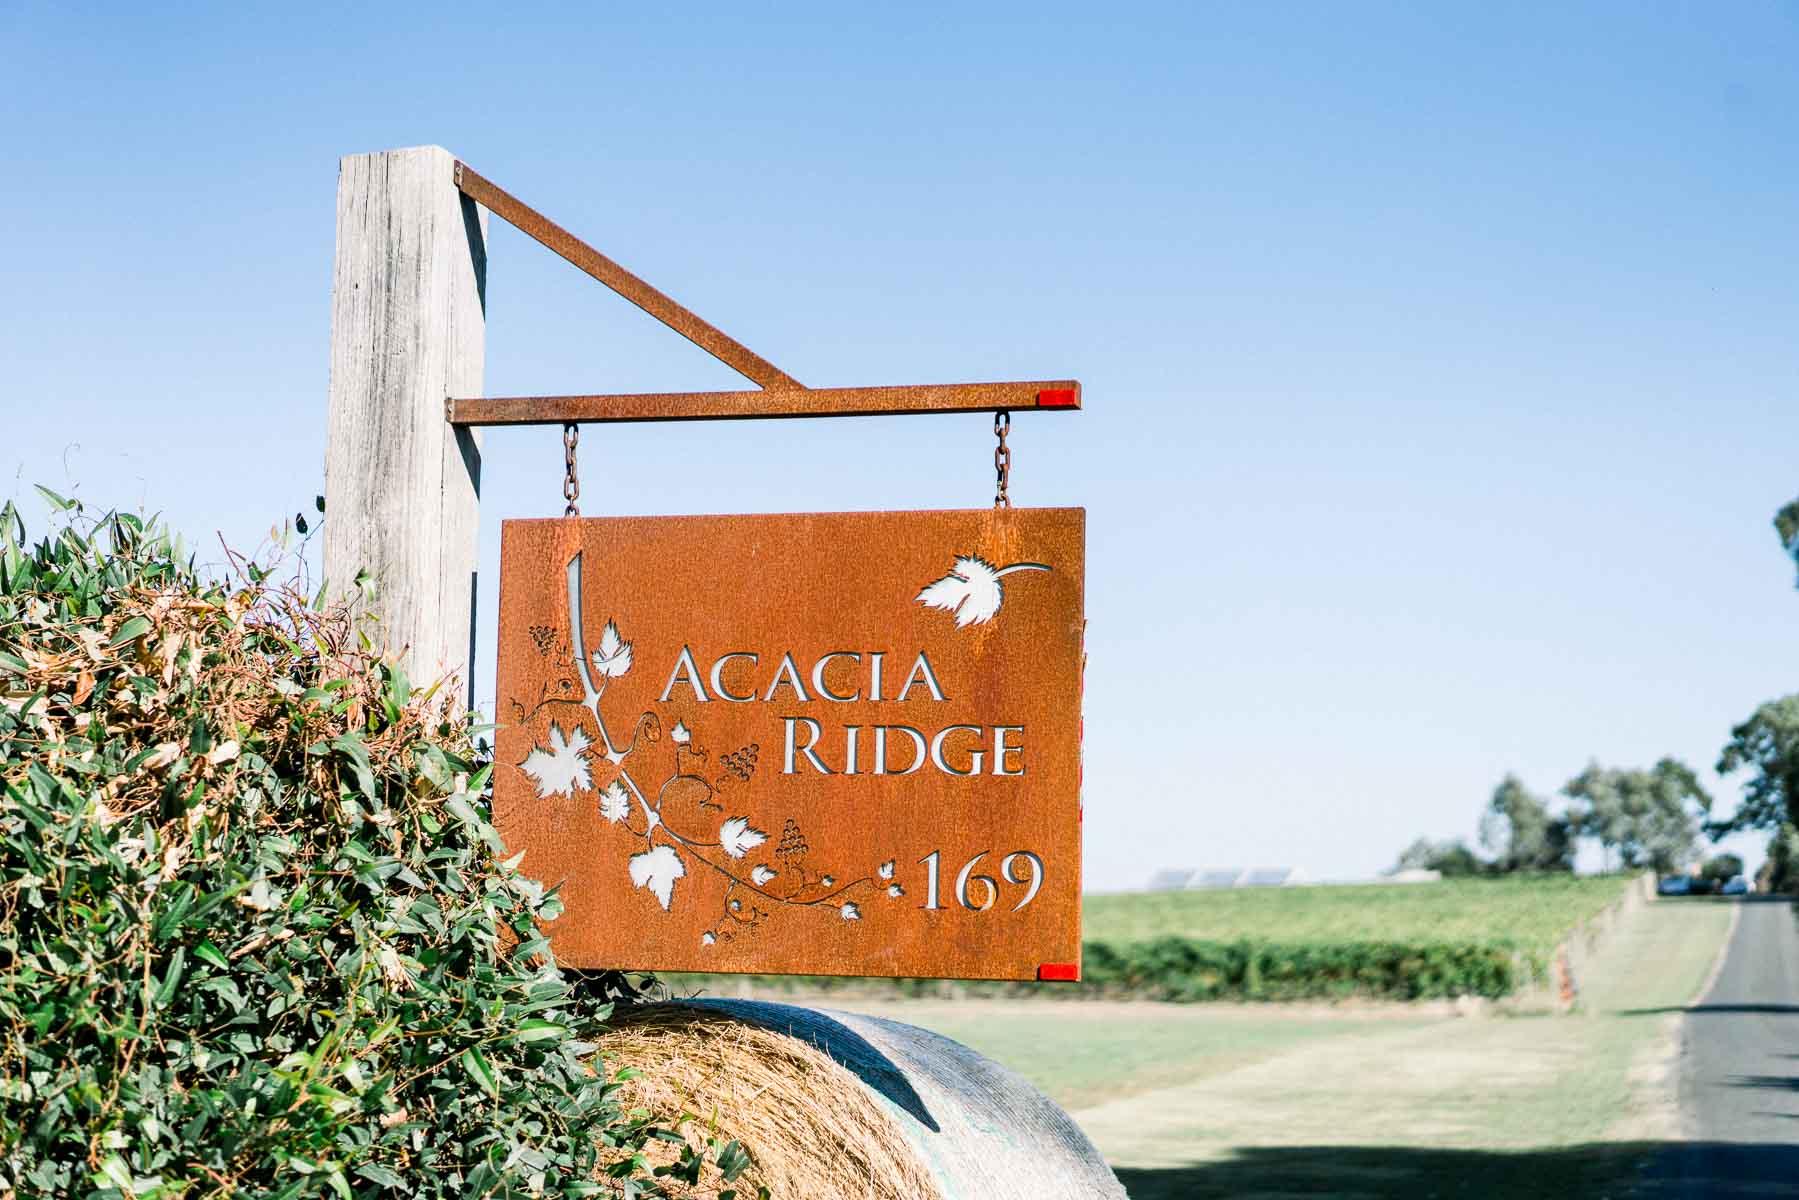 rustic-yarra-valley-wedding-venue-acacia-ridge-georgia-james-07940.jpg